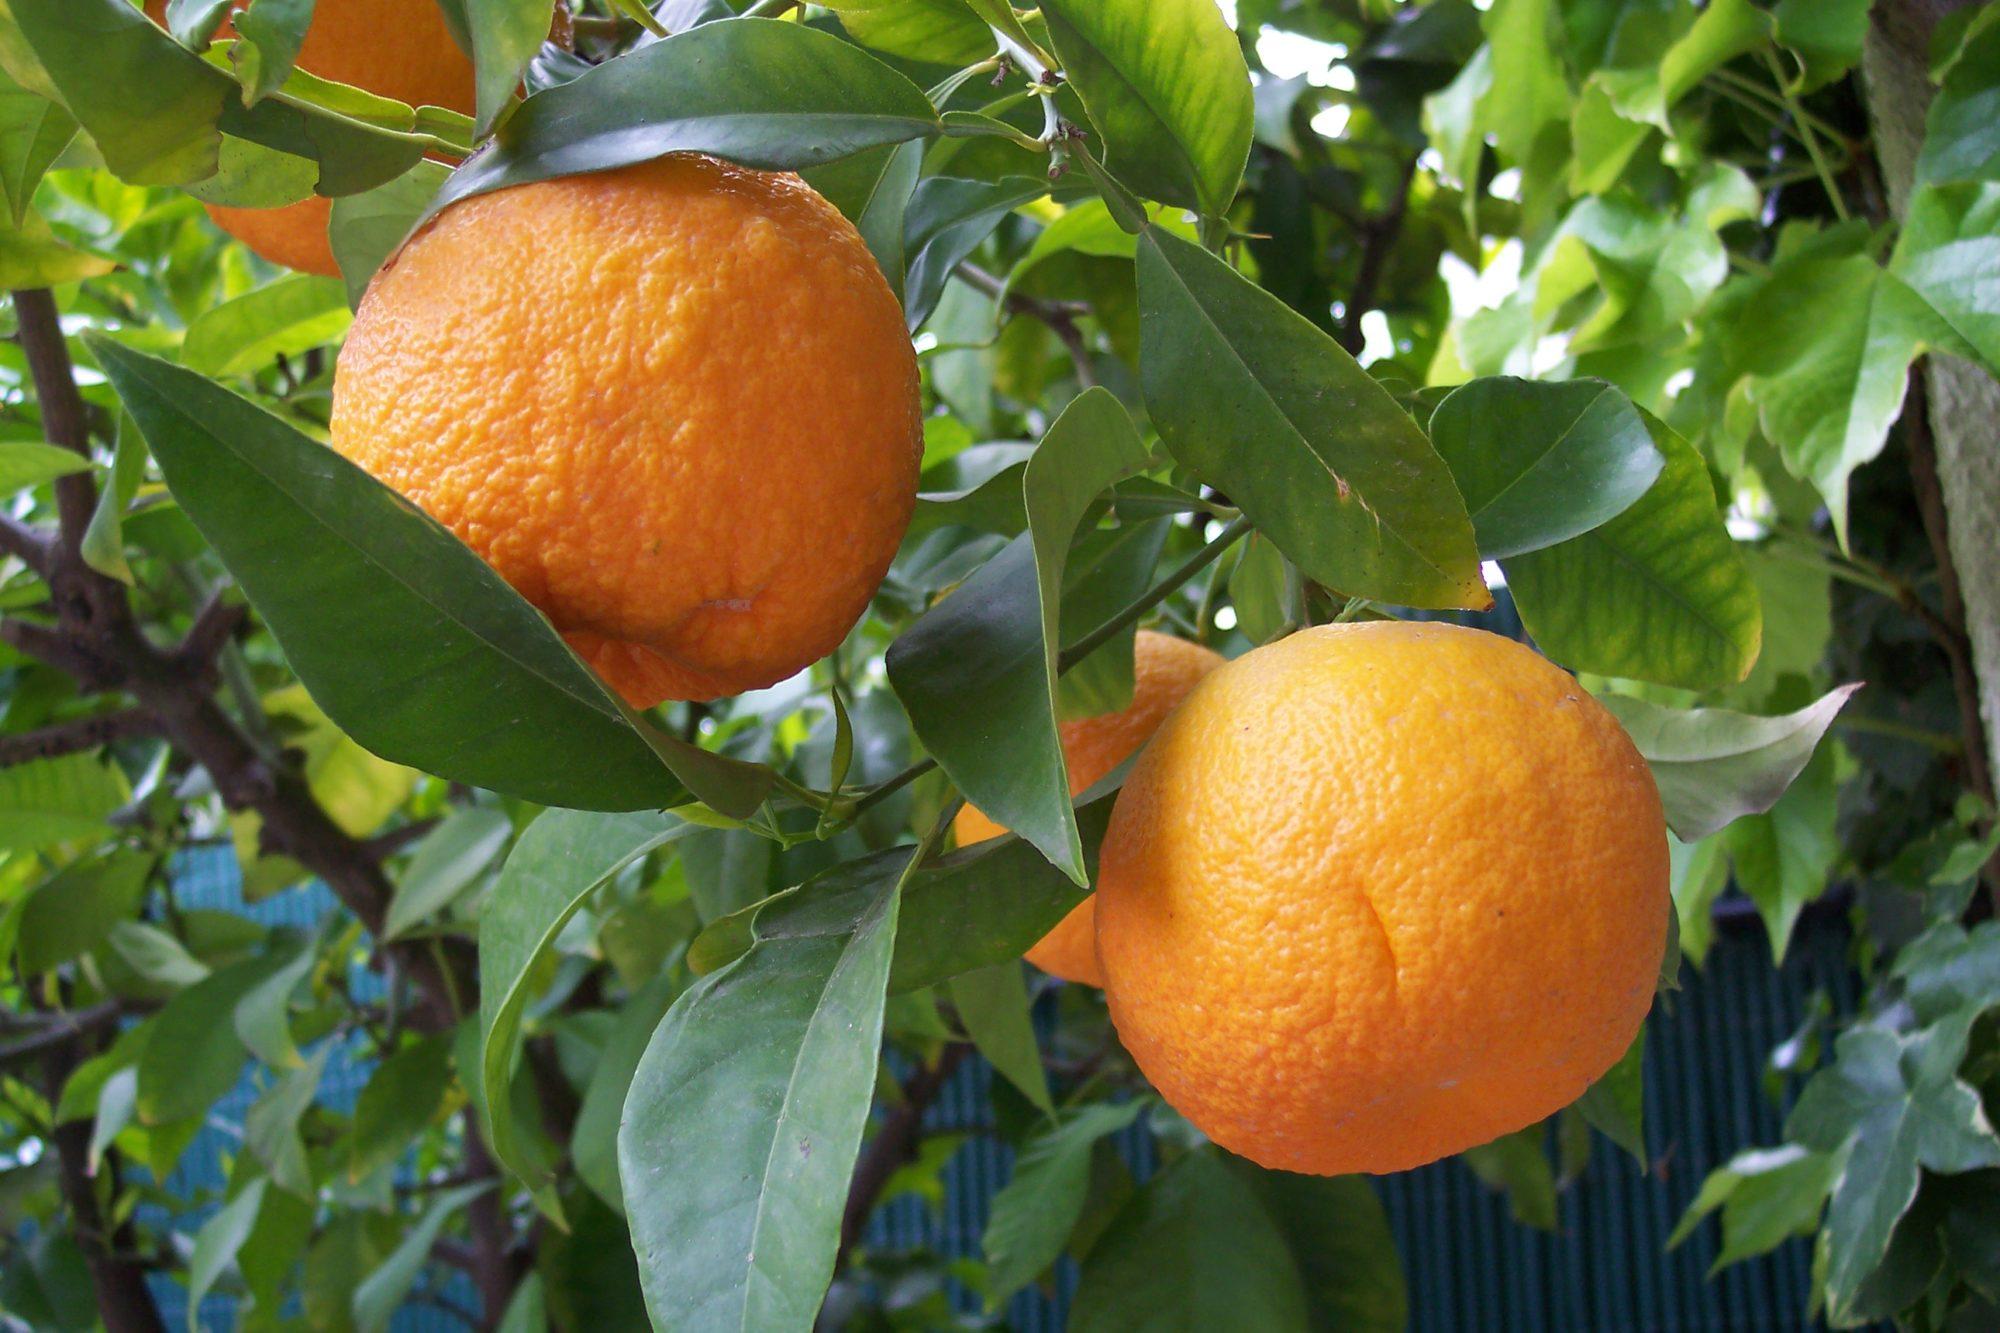 citrus_aurantium-wiki-e1523387743346.jpg